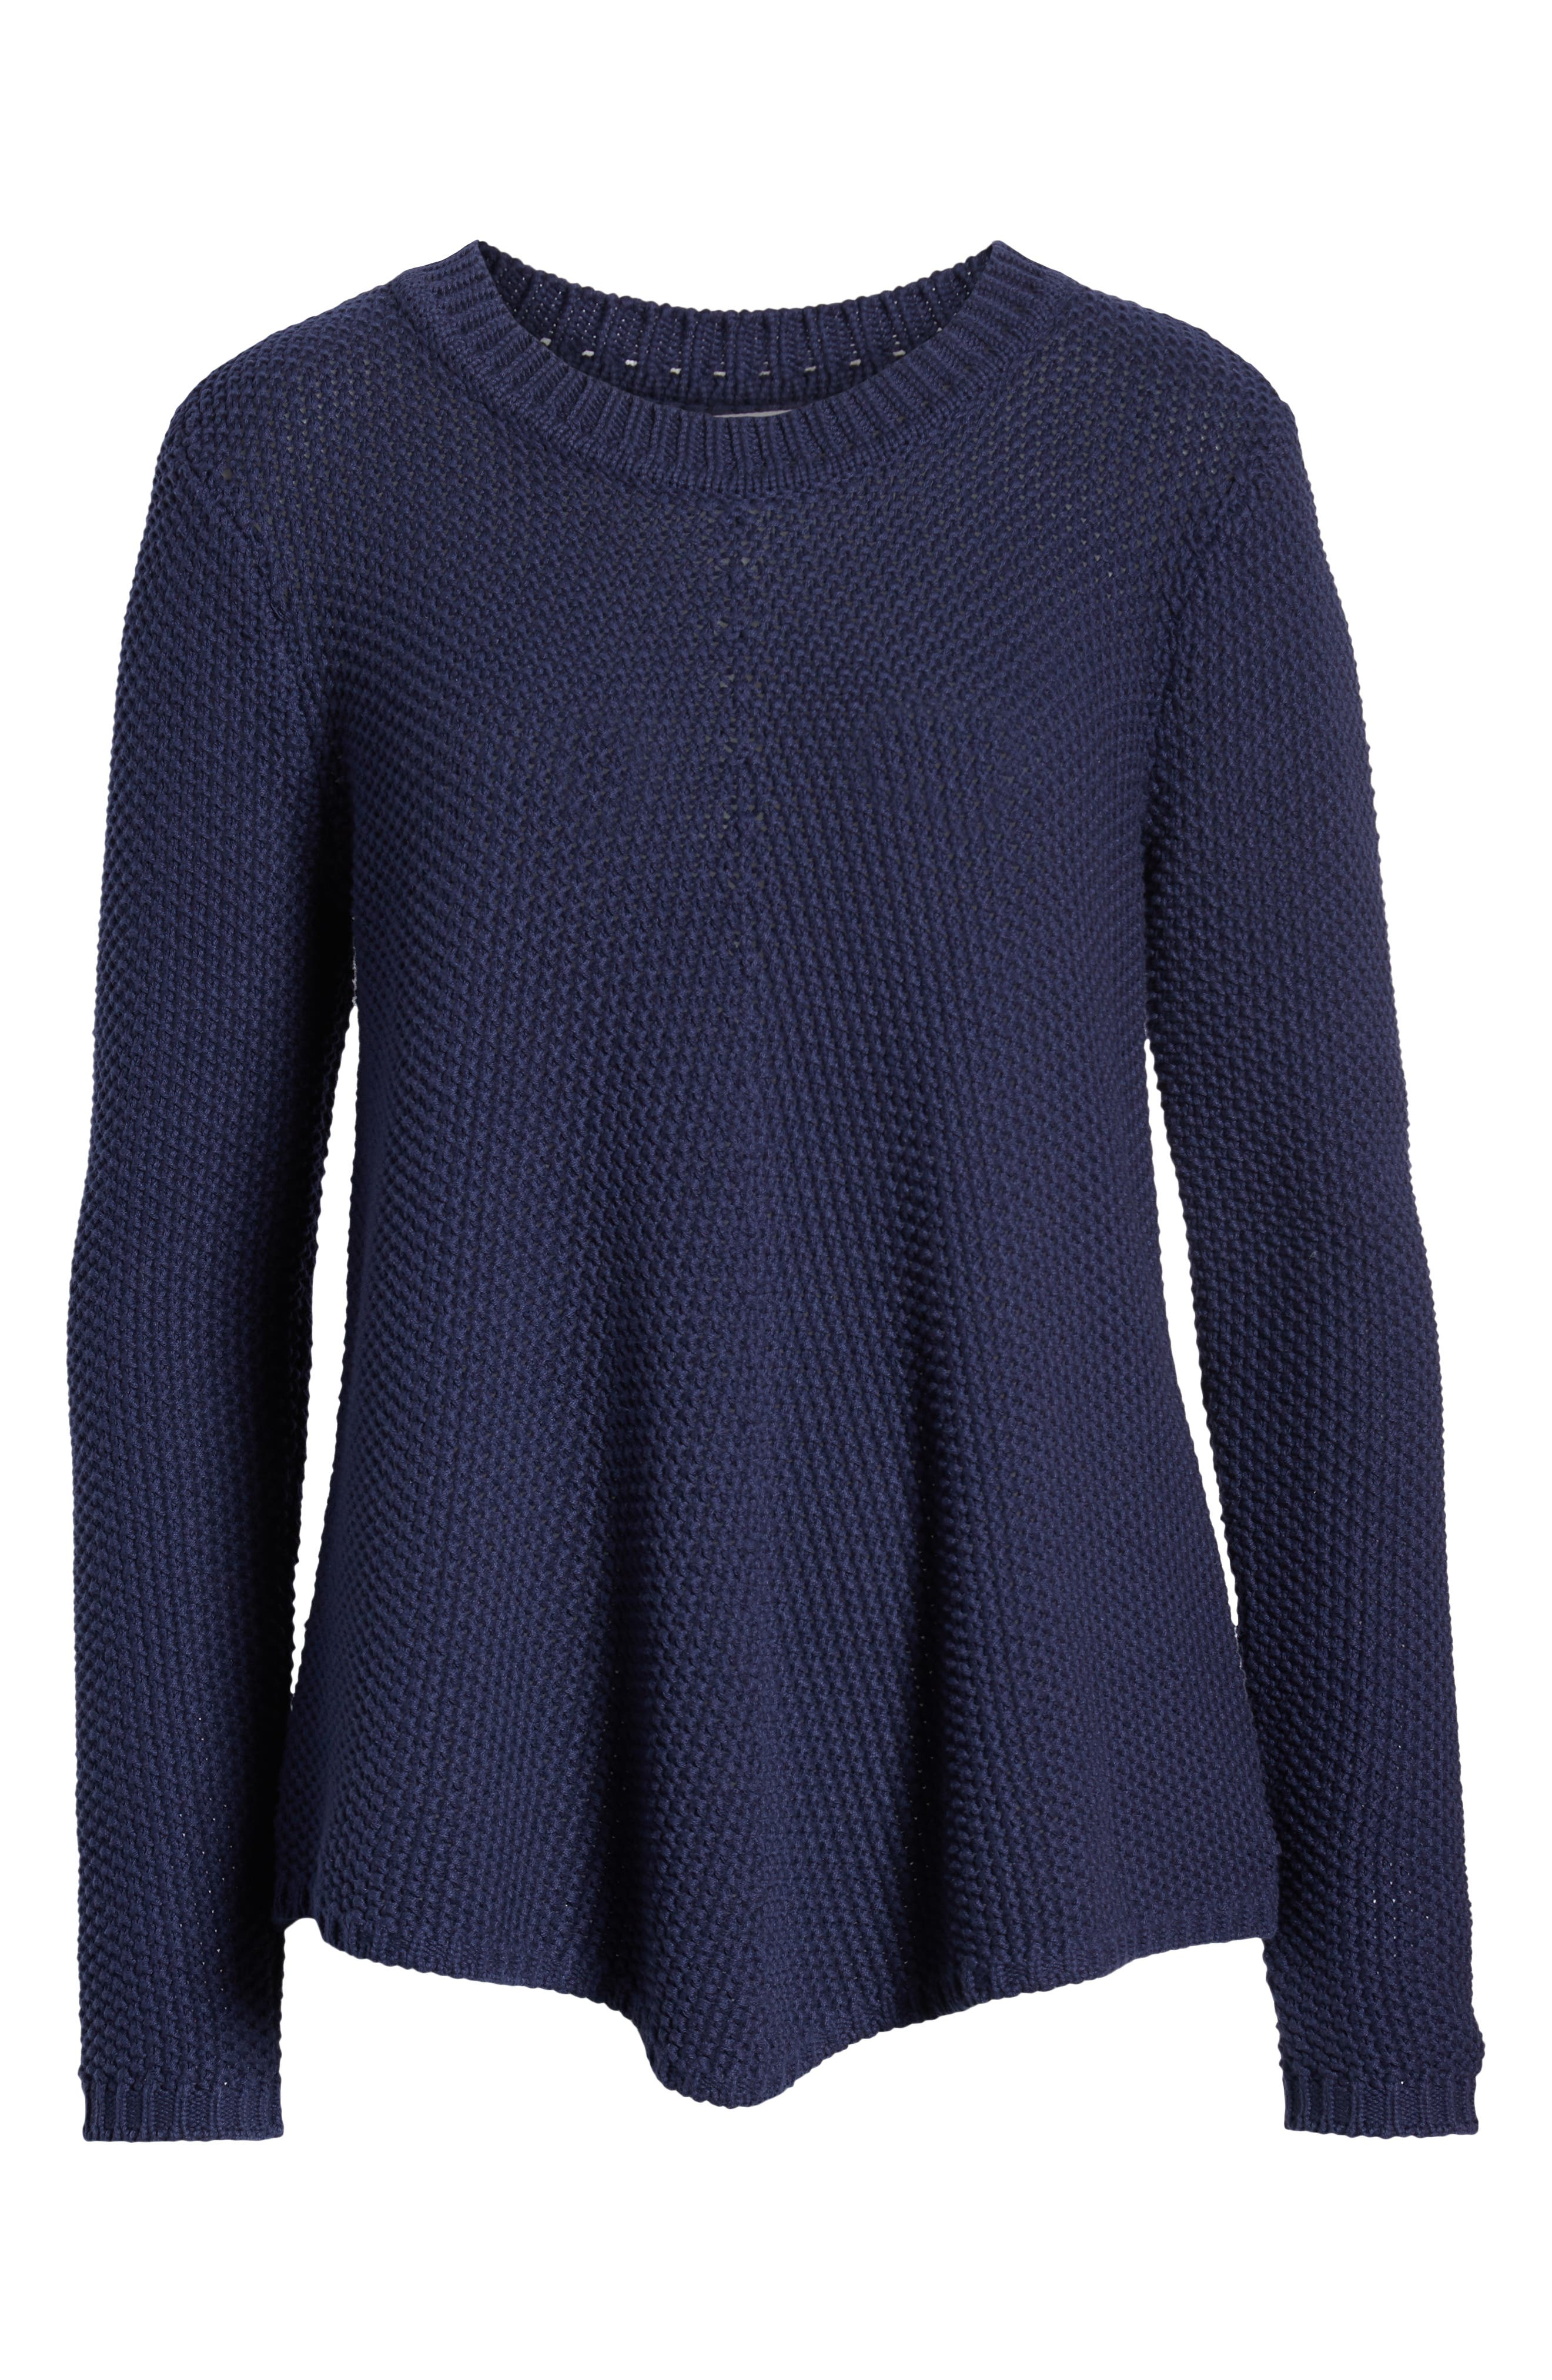 CASLON<SUP>®</SUP>, Stitch Stripe Sweater, Alternate thumbnail 6, color, NAVY PEACOAT